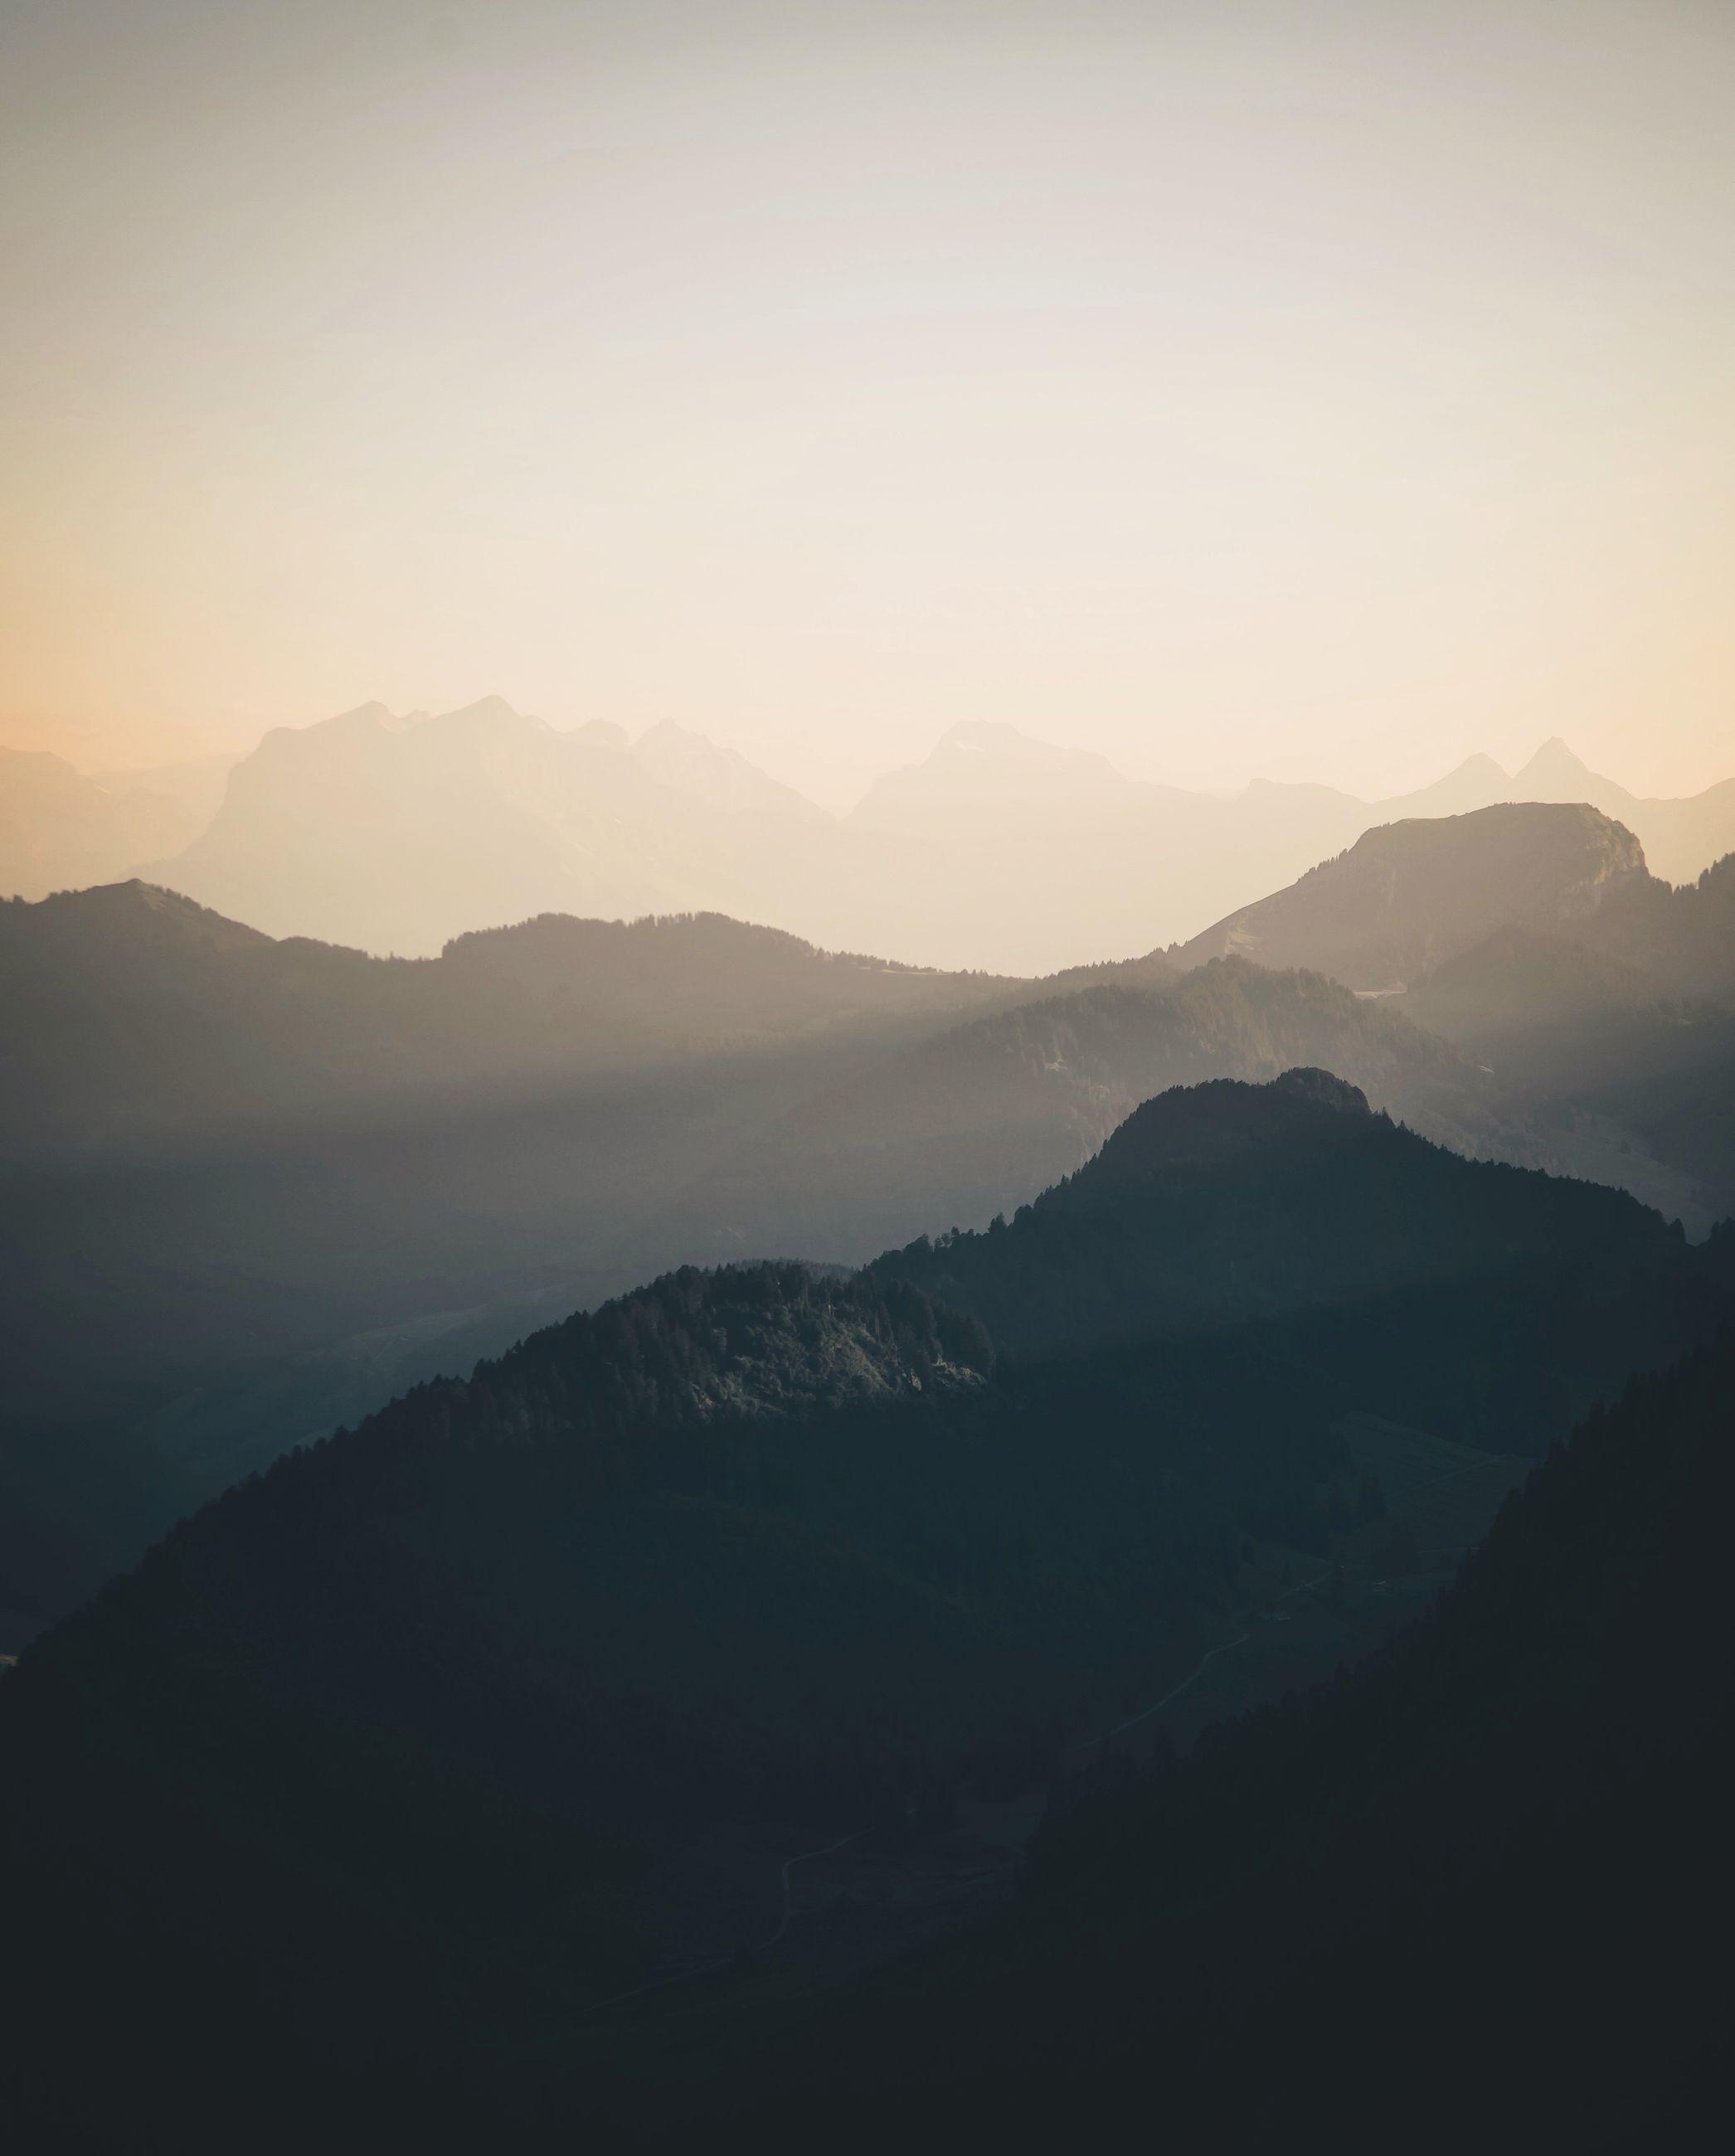 mountain, mountain range, tranquil scene, tranquility, scenics, beauty in nature, landscape, fog, nature, sunset, idyllic, sky, non-urban scene, outdoors, remote, no people, majestic, non urban scene, horizon over land, weather, dark